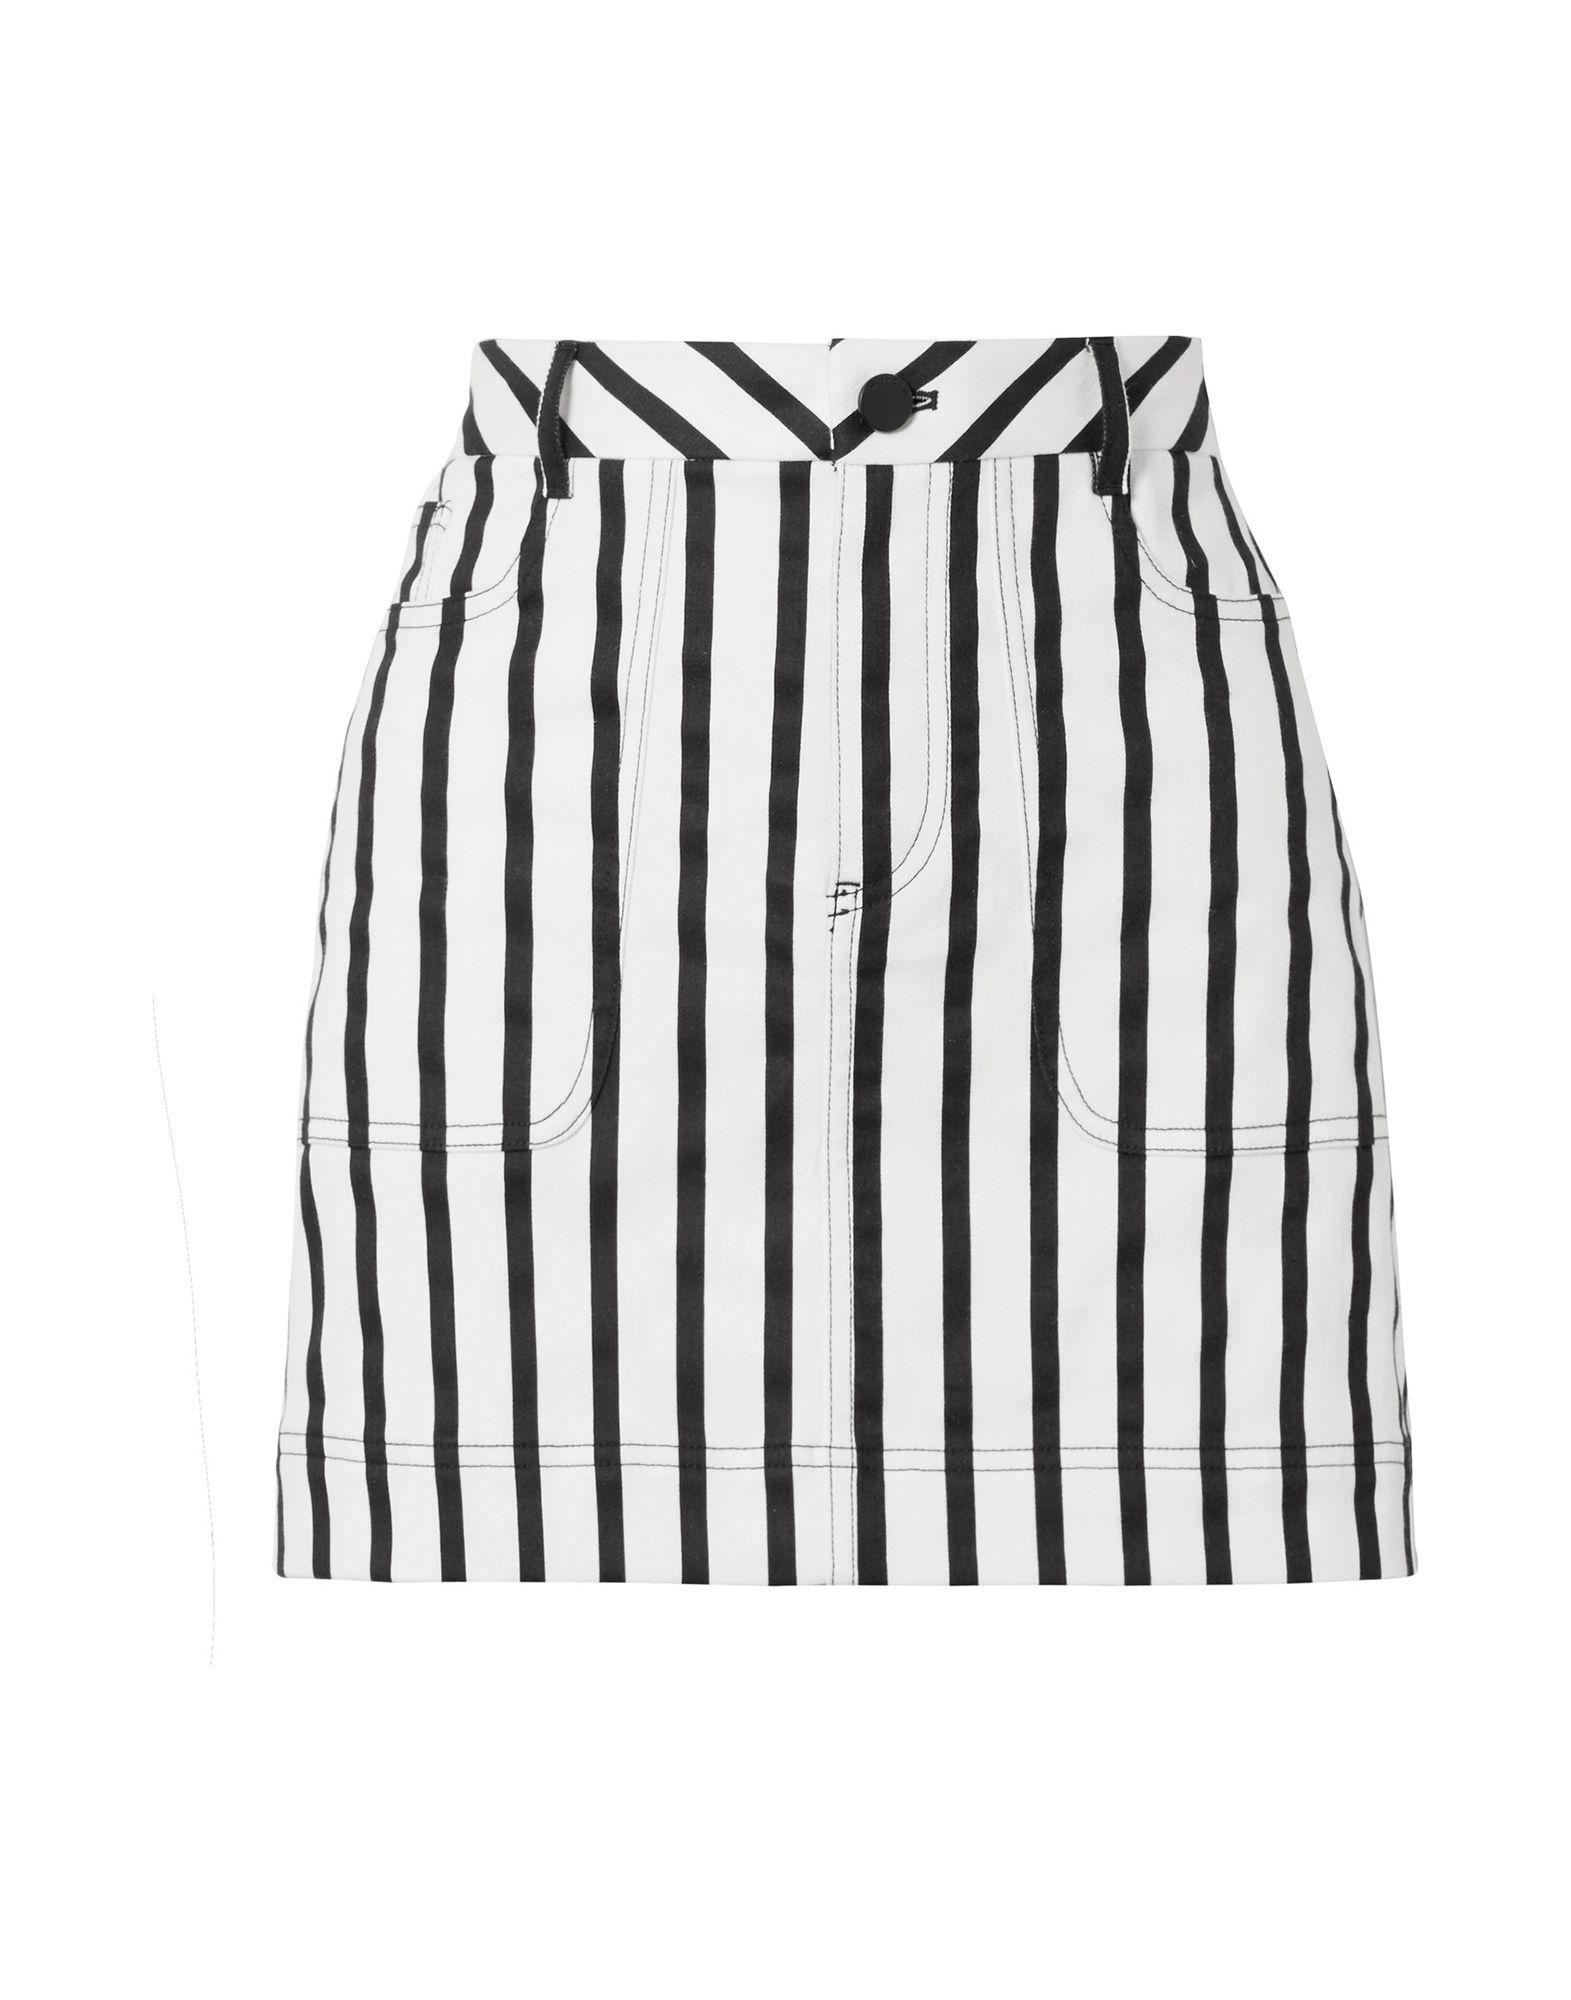 ALICE + OLIVIA Denim skirts. denim, no appliqués, stripes, colored wash, belt loops, front closure, button, zip, multipockets, unlined, stretch. 86% Cotton, 11% Polyester, 3% Elastane